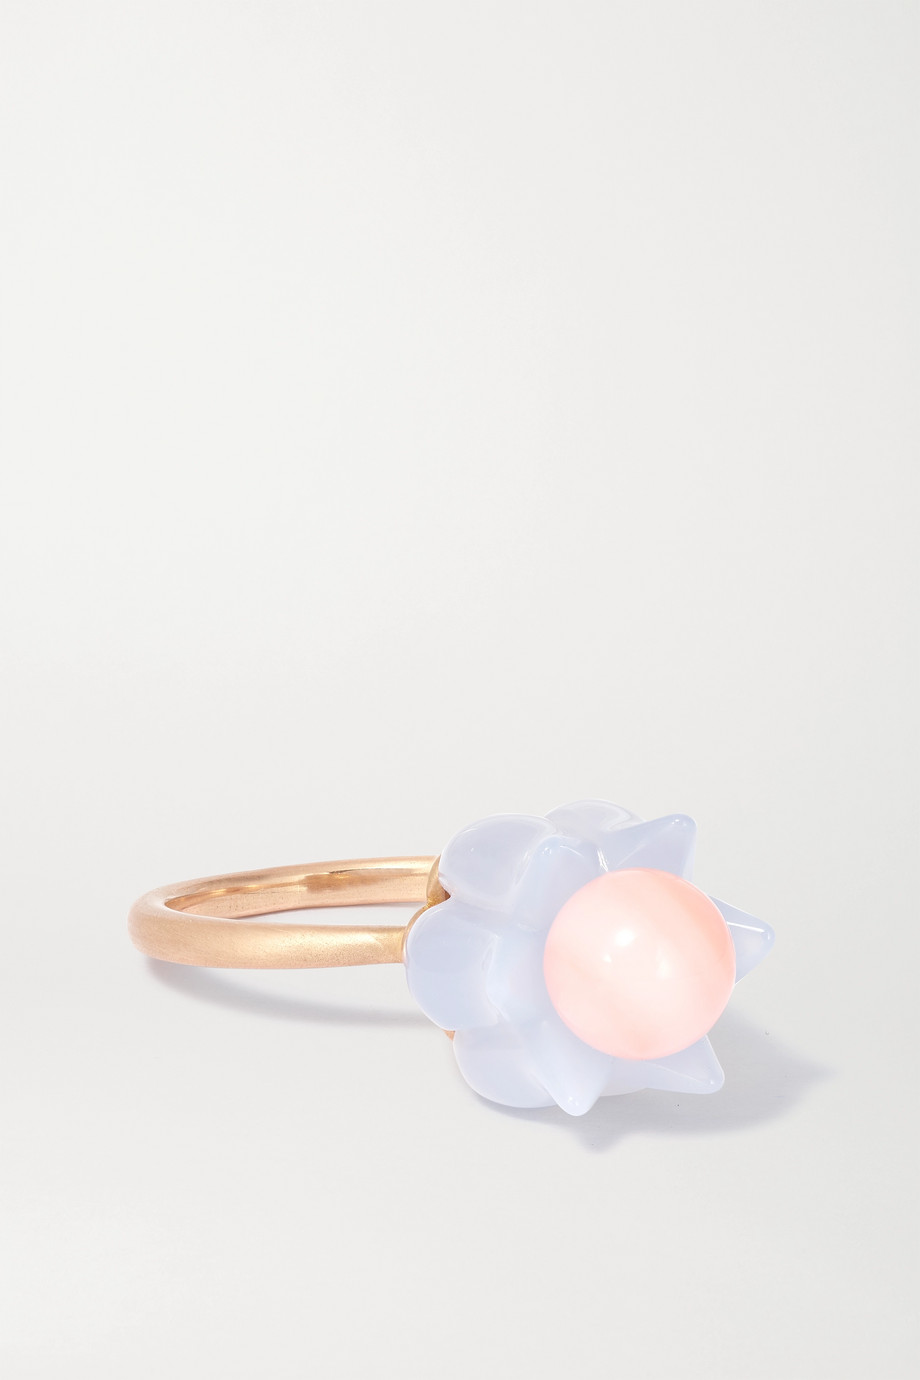 Irene Neuwirth Botanical 18-karat rose gold, chalcedony and opal ring